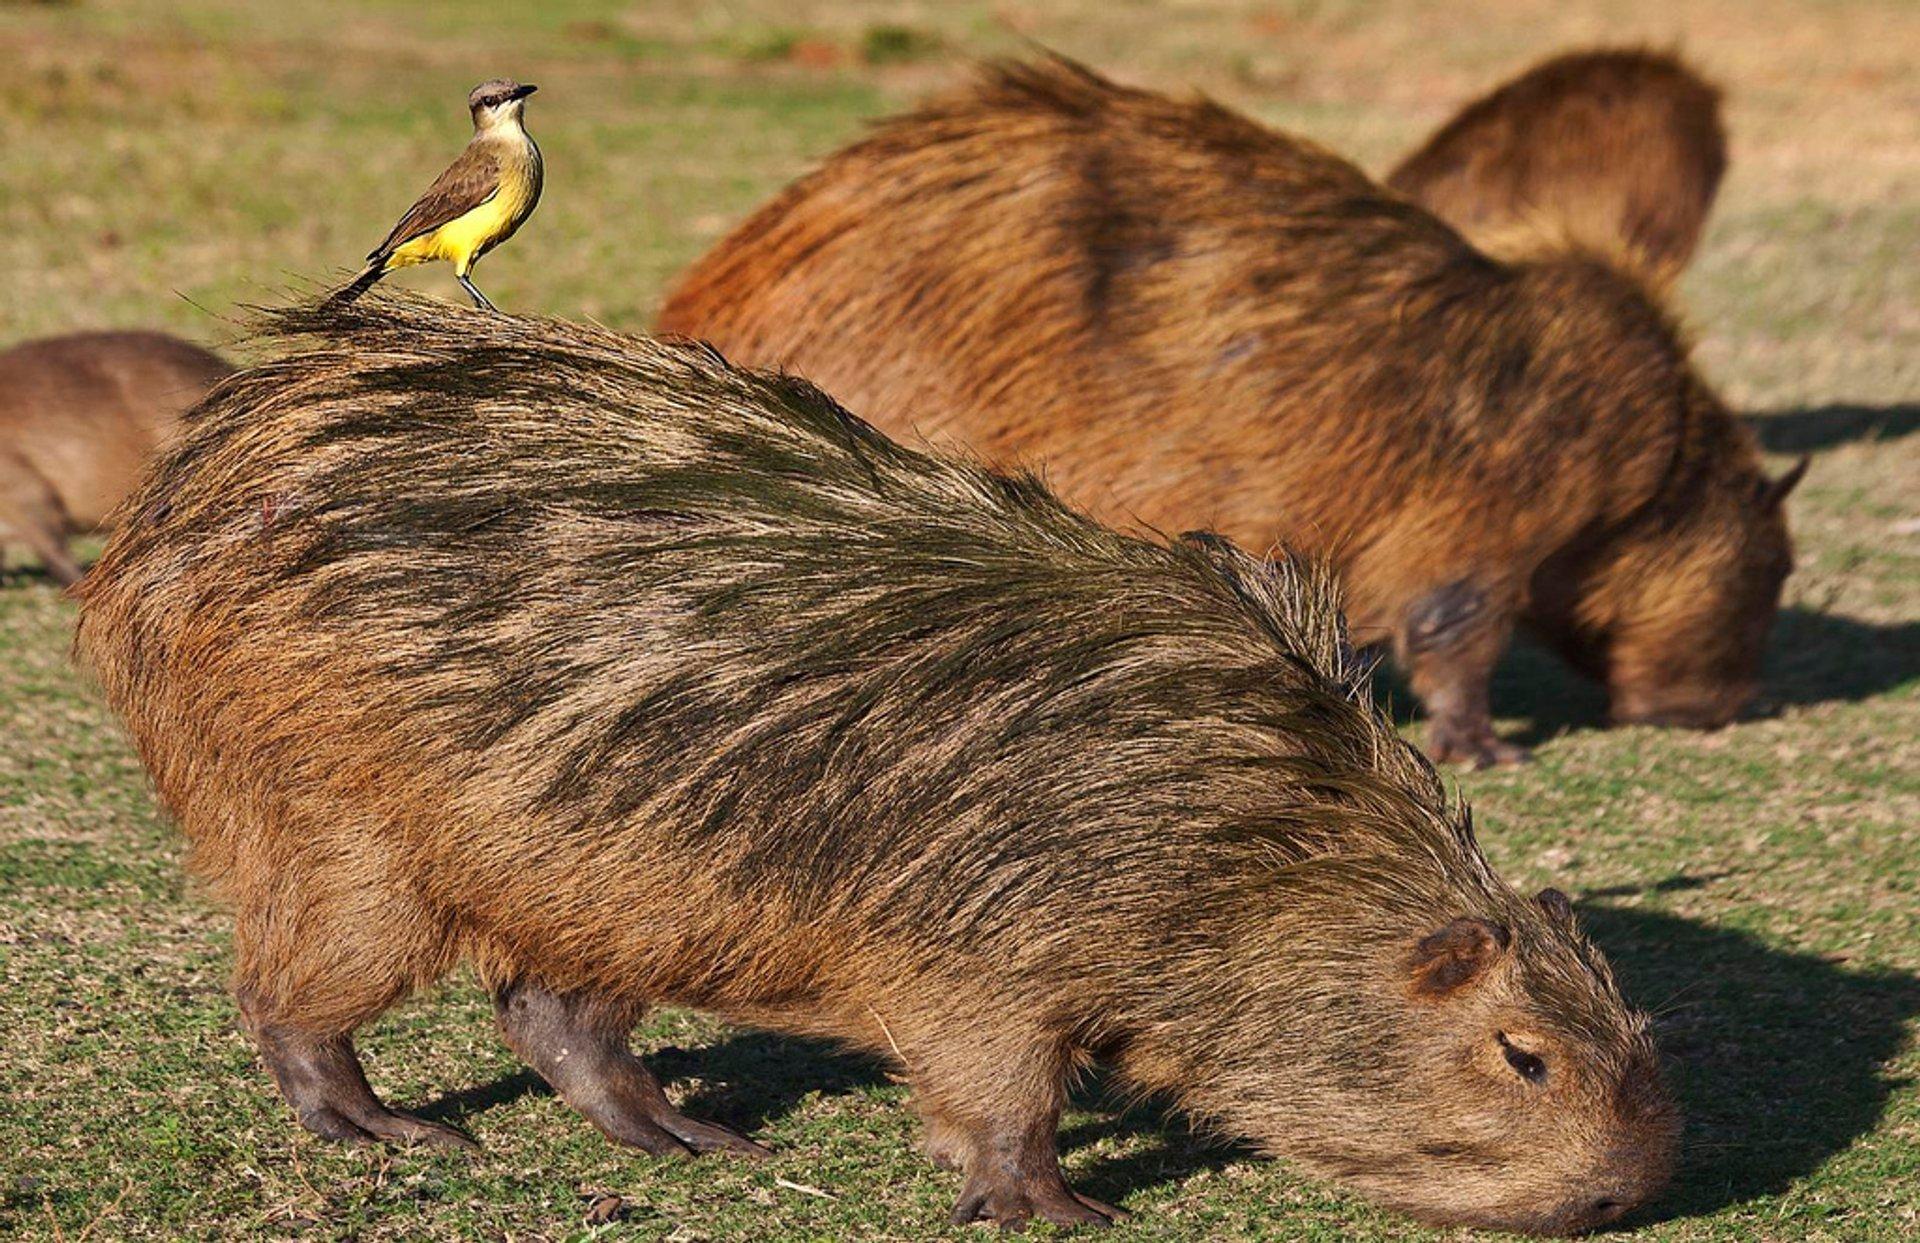 Capybara Watching (Breeding Season) in Rio de Janeiro - Best Season 2019